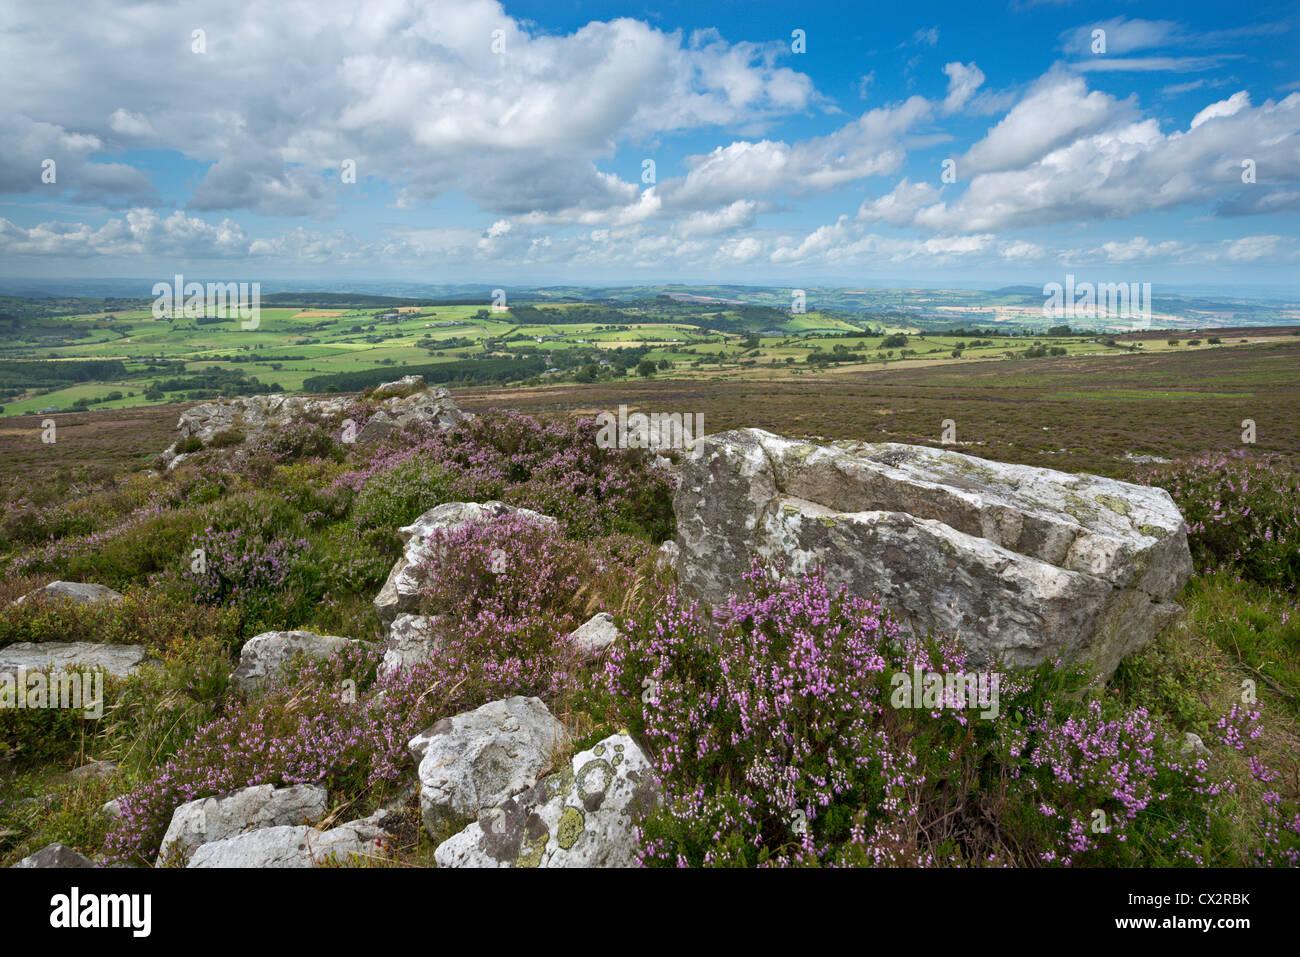 Flowering heather on the Stiperstones ridge, Shropshire, England. Summer (August) 2012. - Stock Image